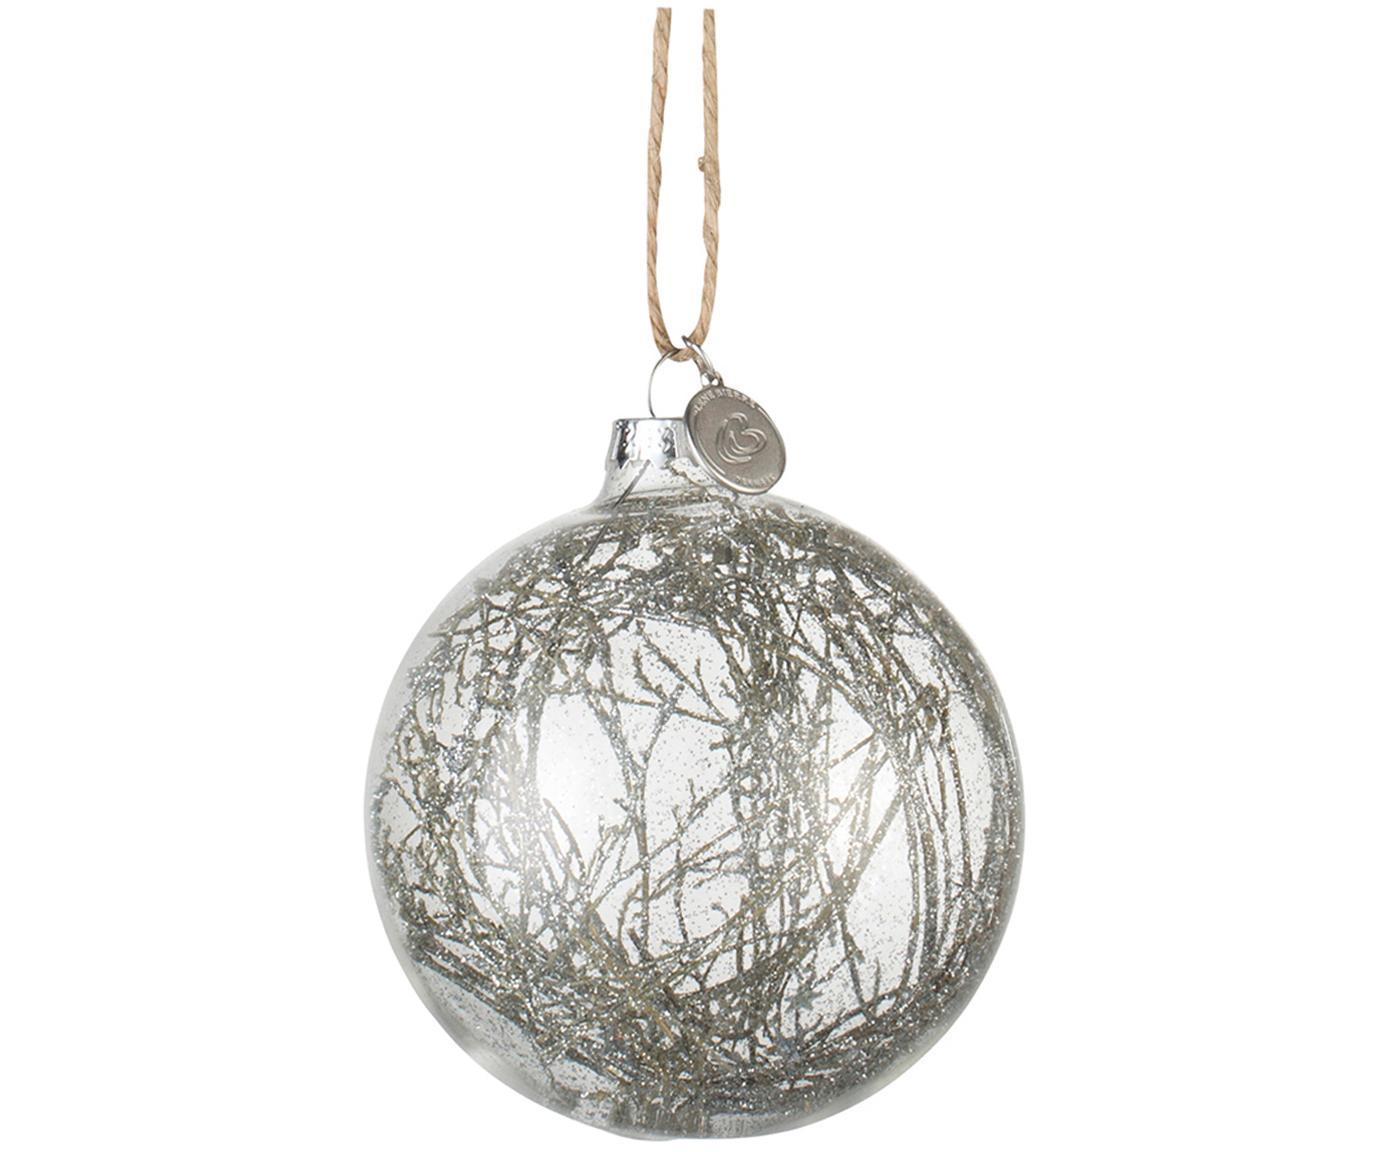 Palline di Natale Mernia Ø 8 cm, 2 pz, Trasparente, argento, Ø 8 cm